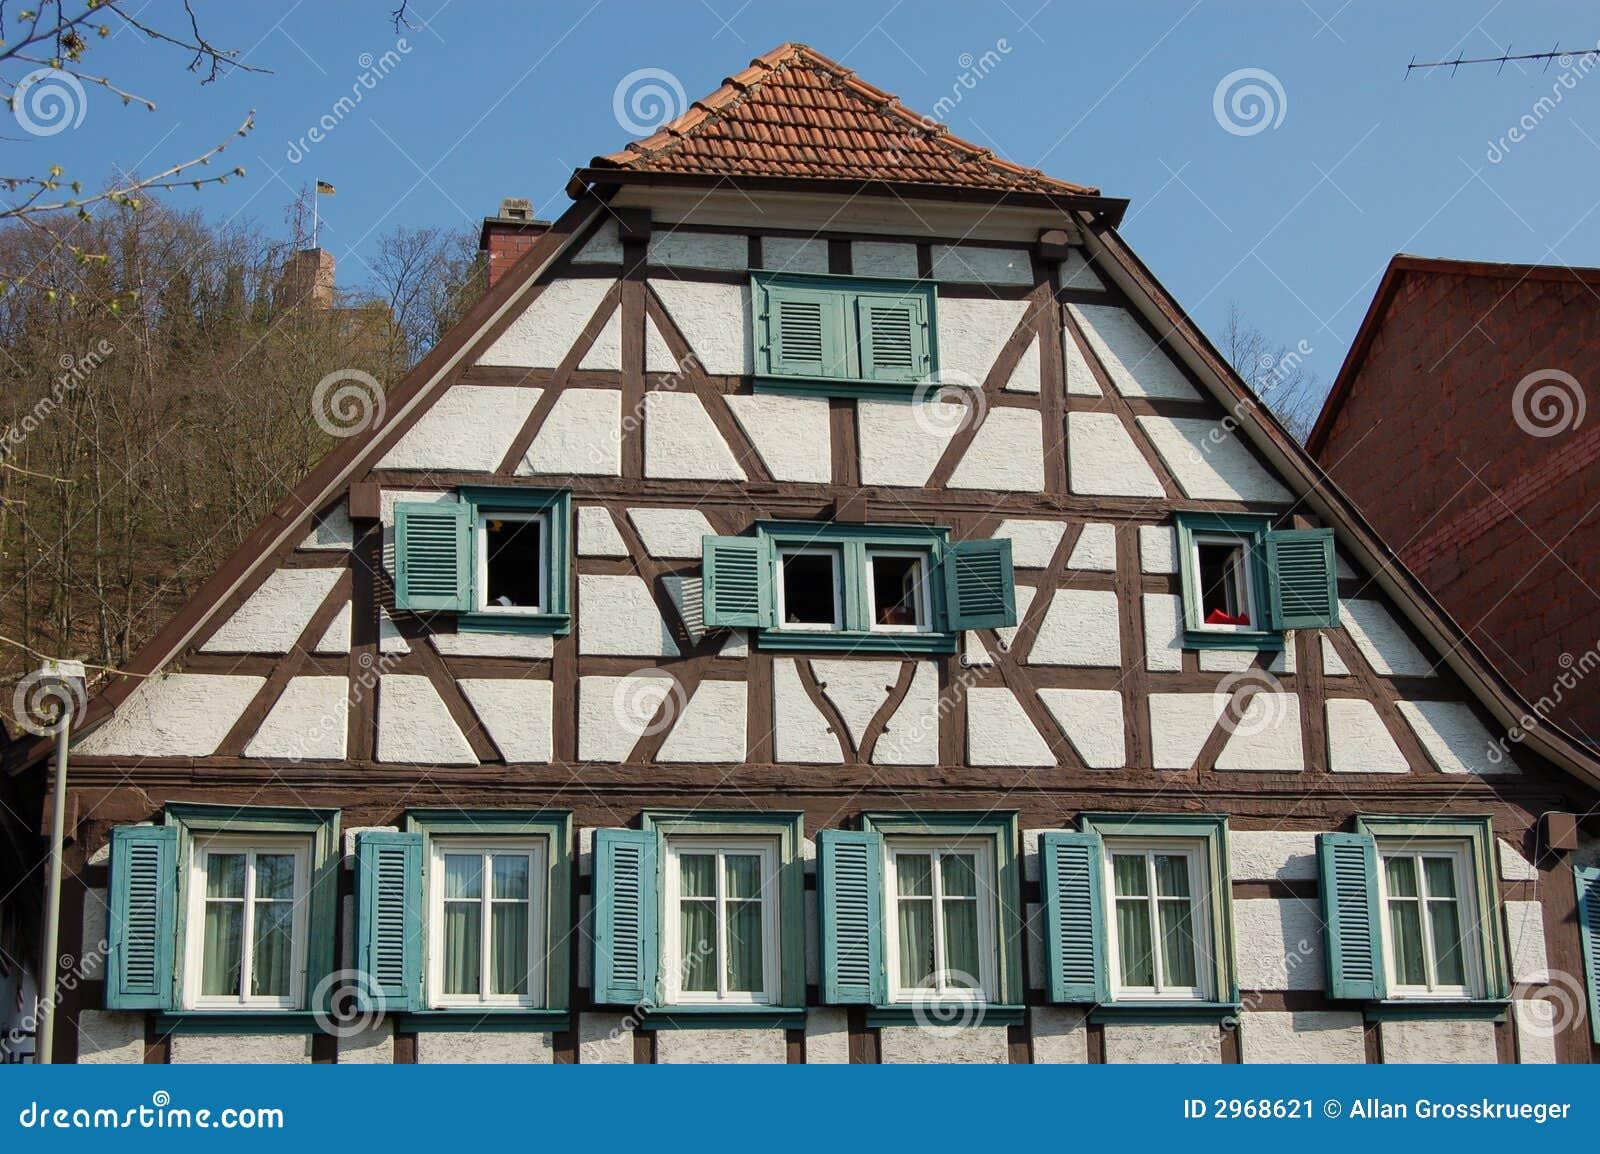 German Timber House Stock Image - Image: 2968621